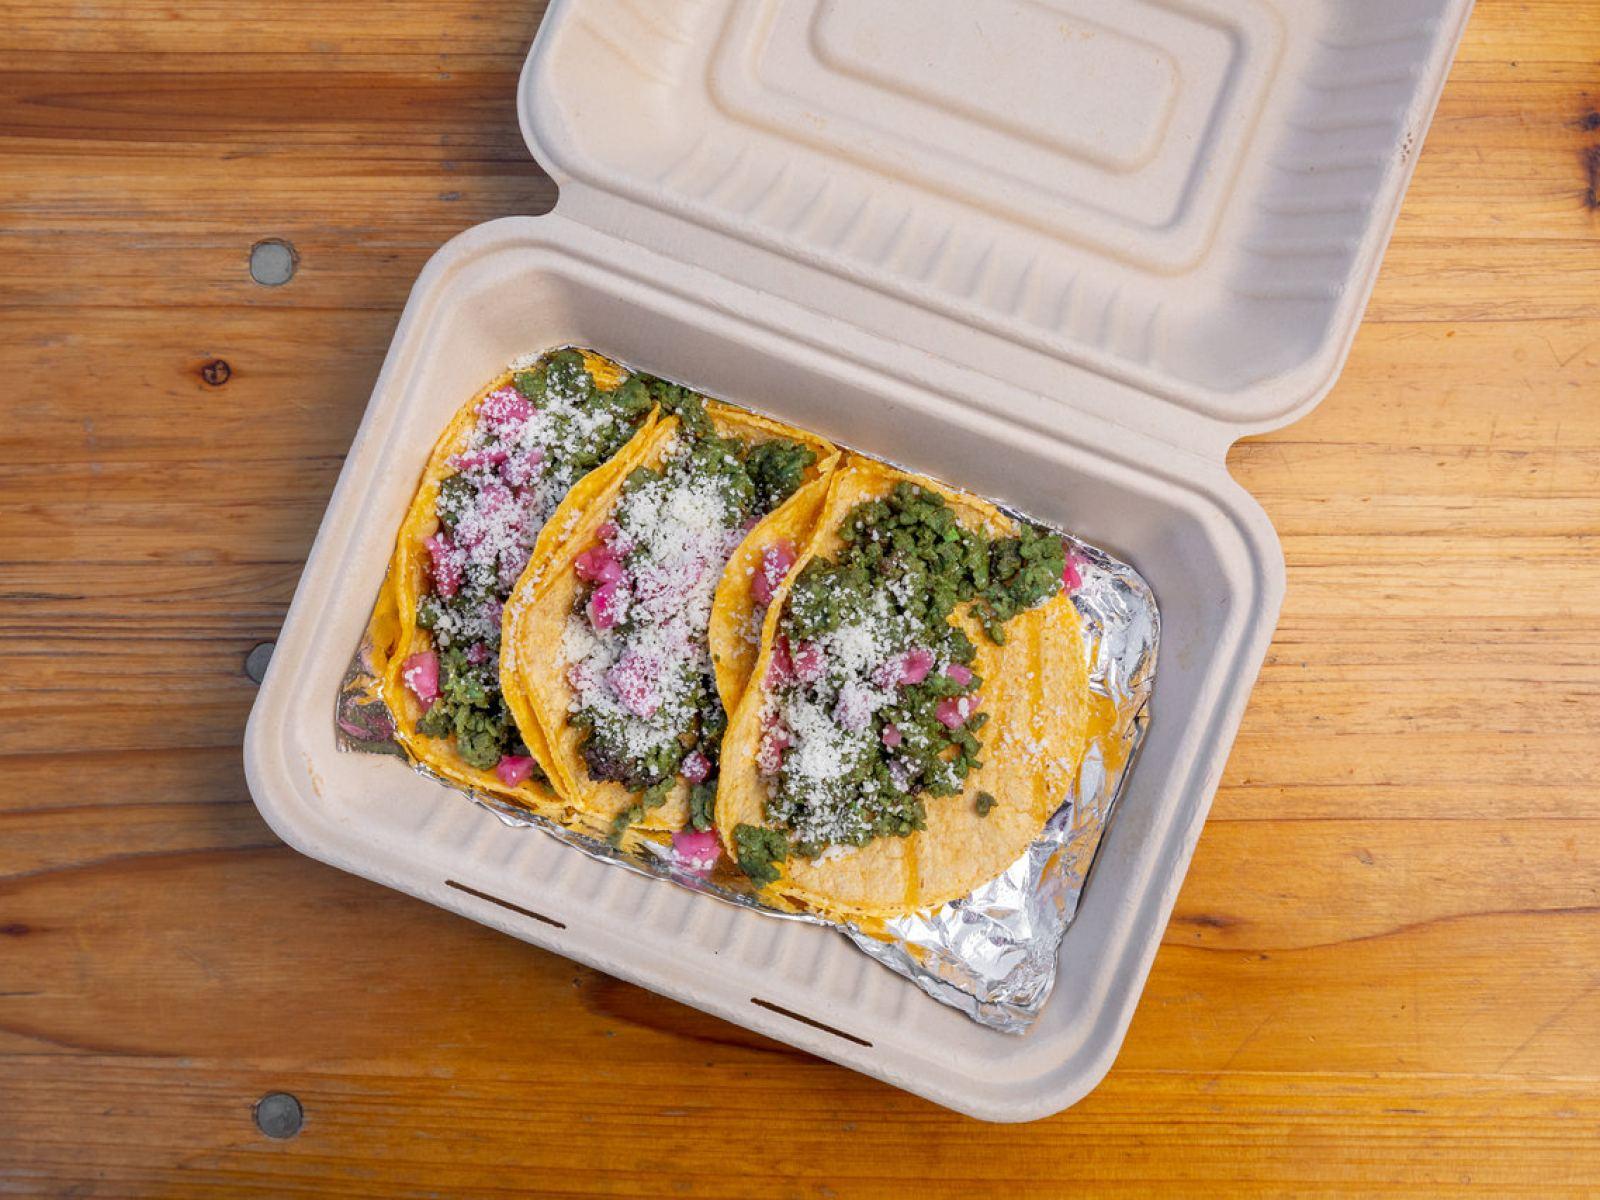 Tolucan green tacos